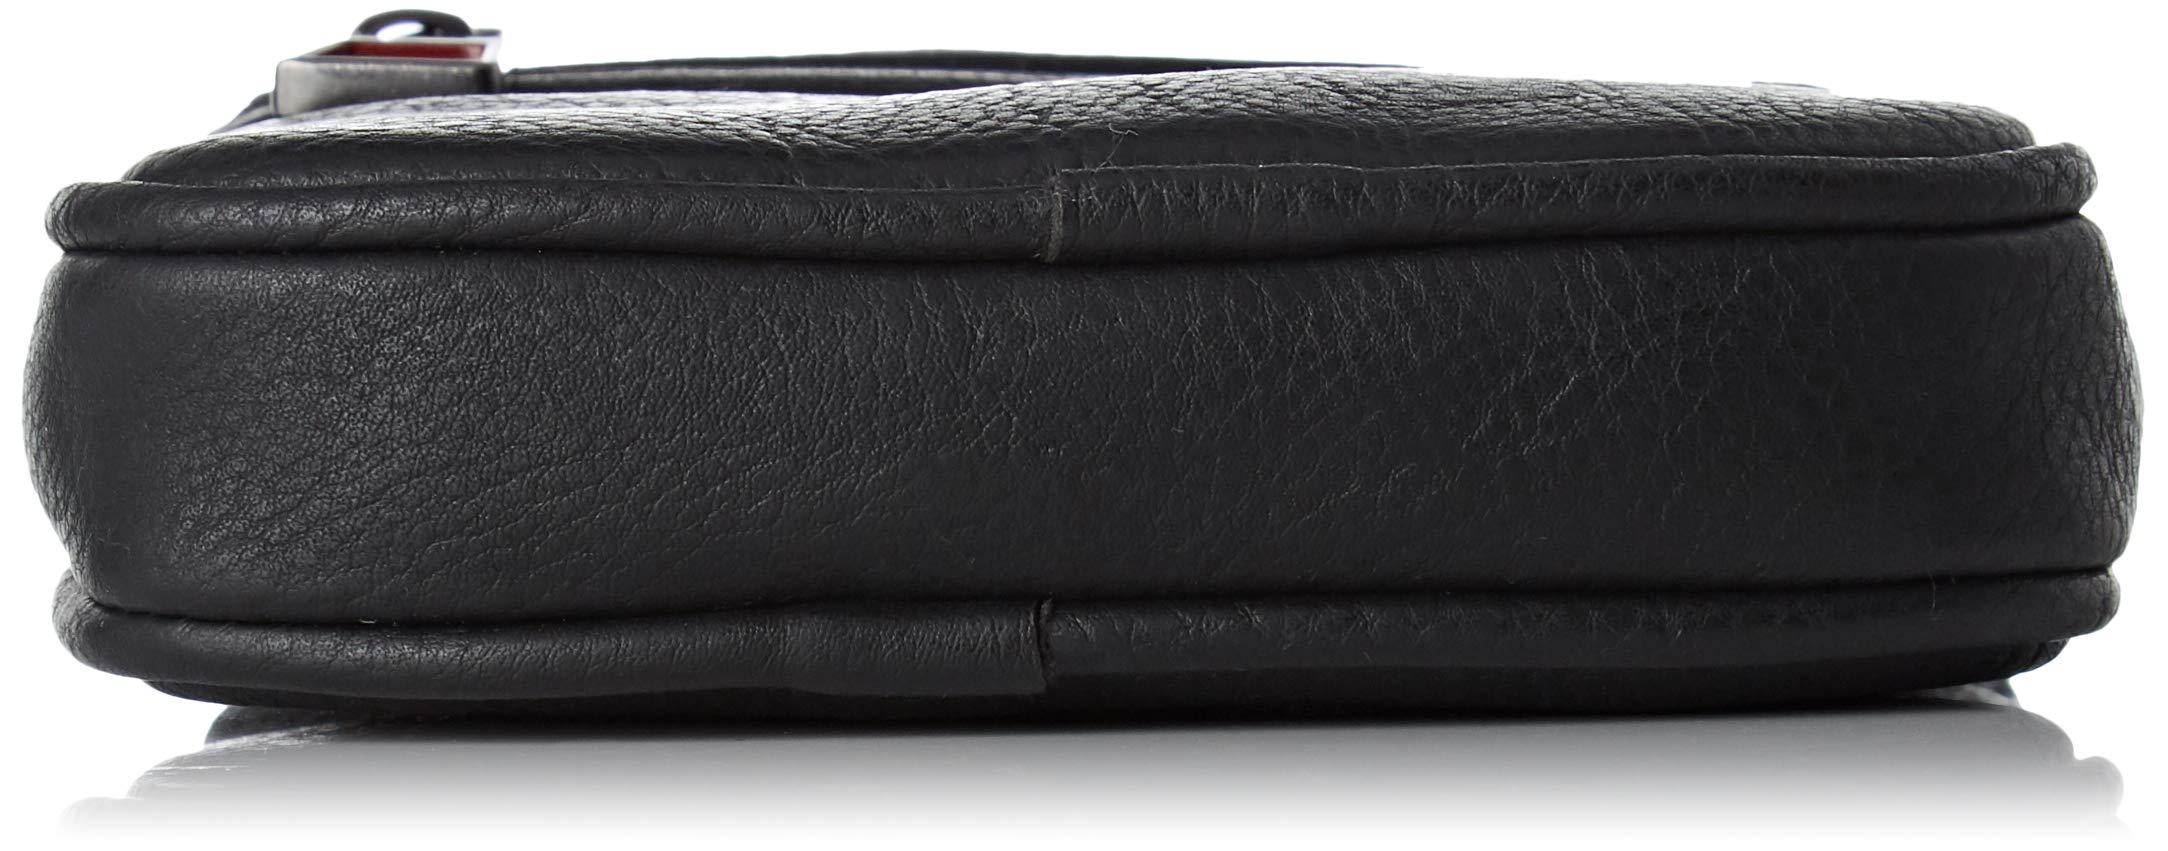 Tommy Hilfiger – Essential Compact Crossover, Bolsas para portátil Hombre, Negro (Tommy Navy/Core Stp), 2x17x13 cm (B x H T)